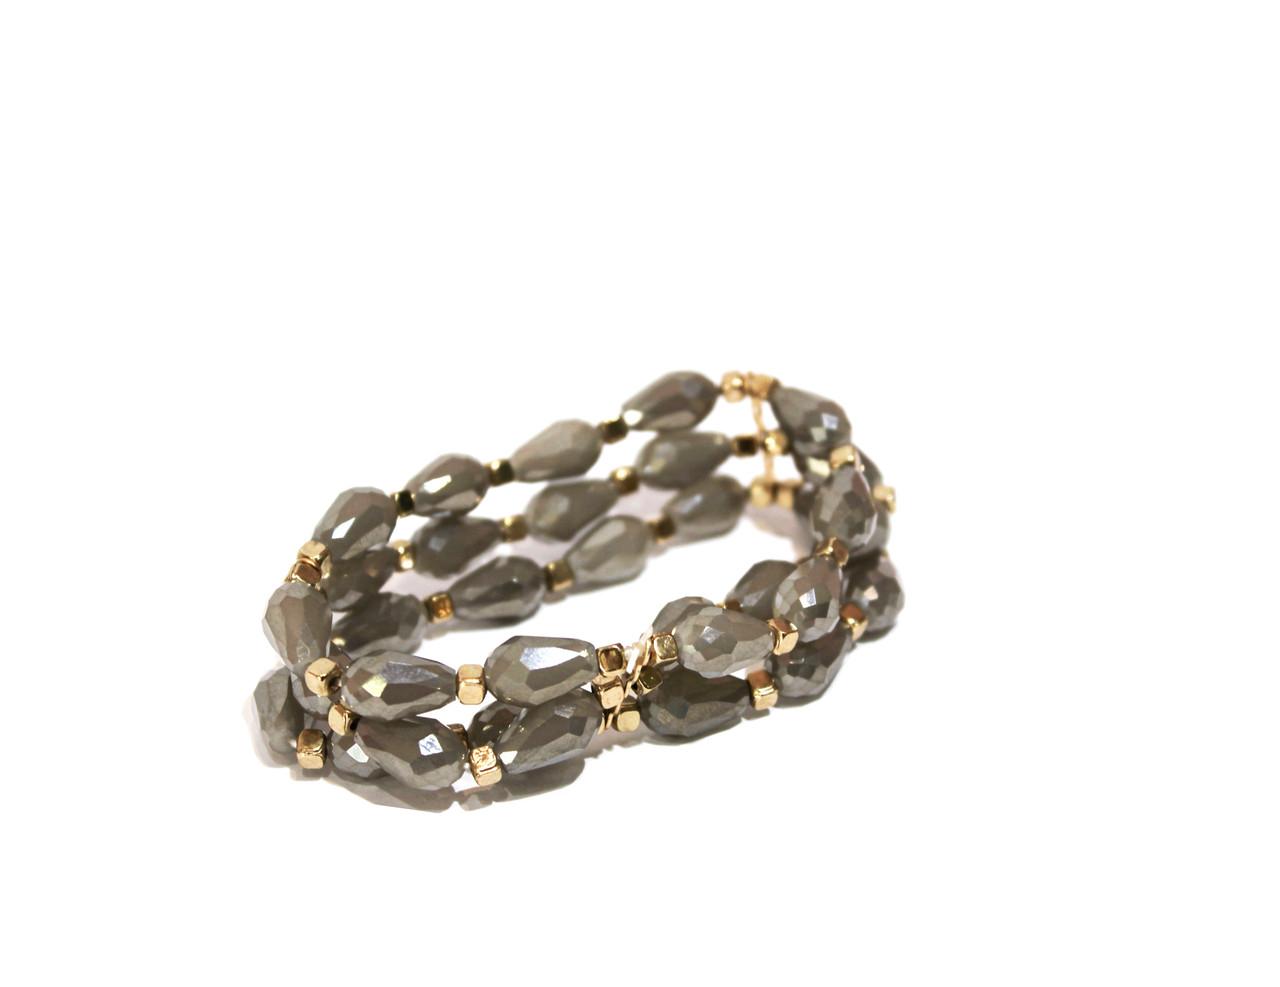 Вечерние браслеты Brosh Jewellery.  Бисер, Тренд 2020г.